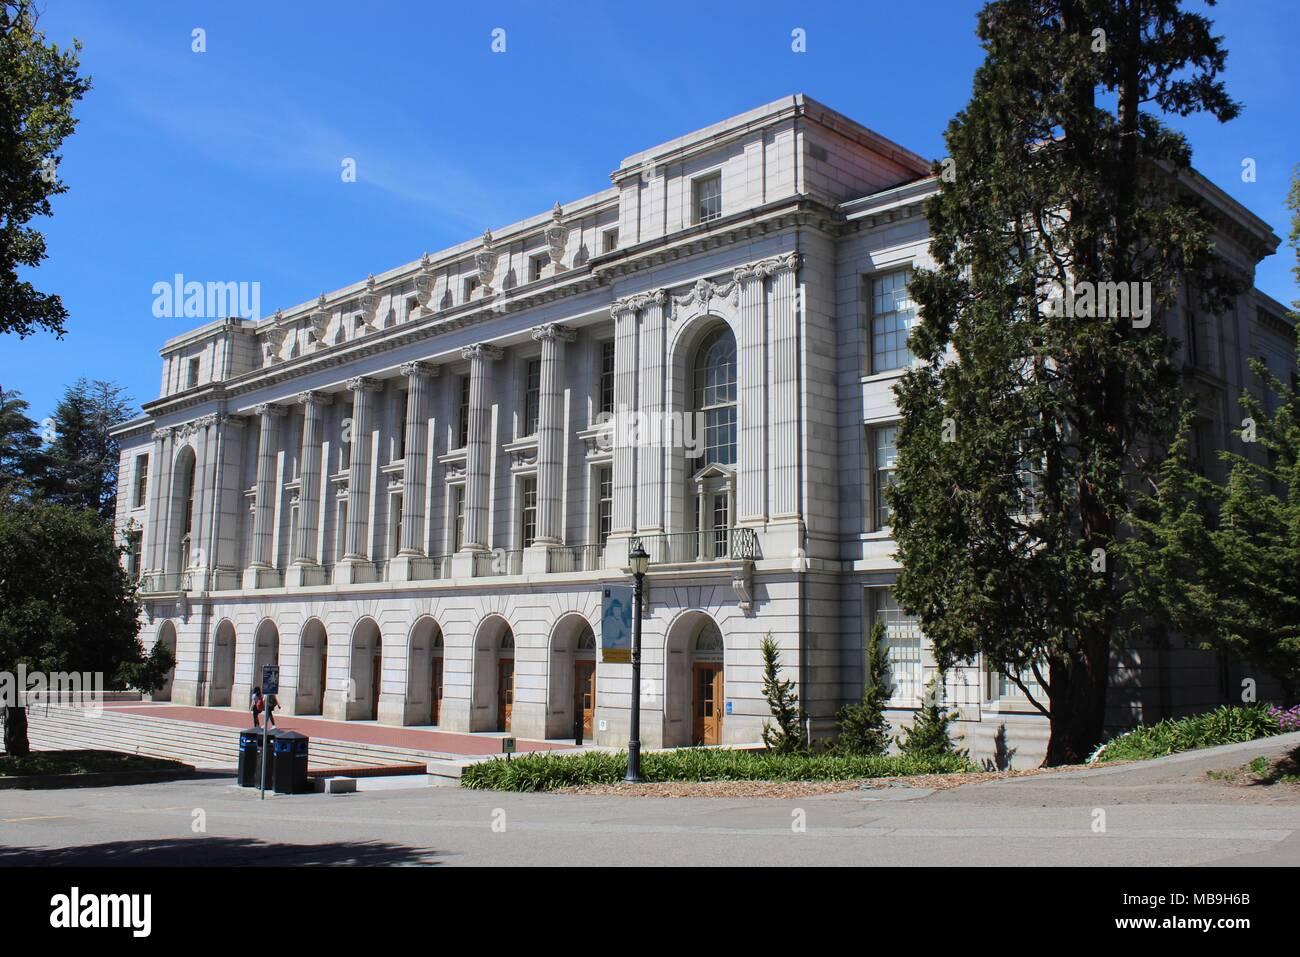 University of california berkeley wheeler hall